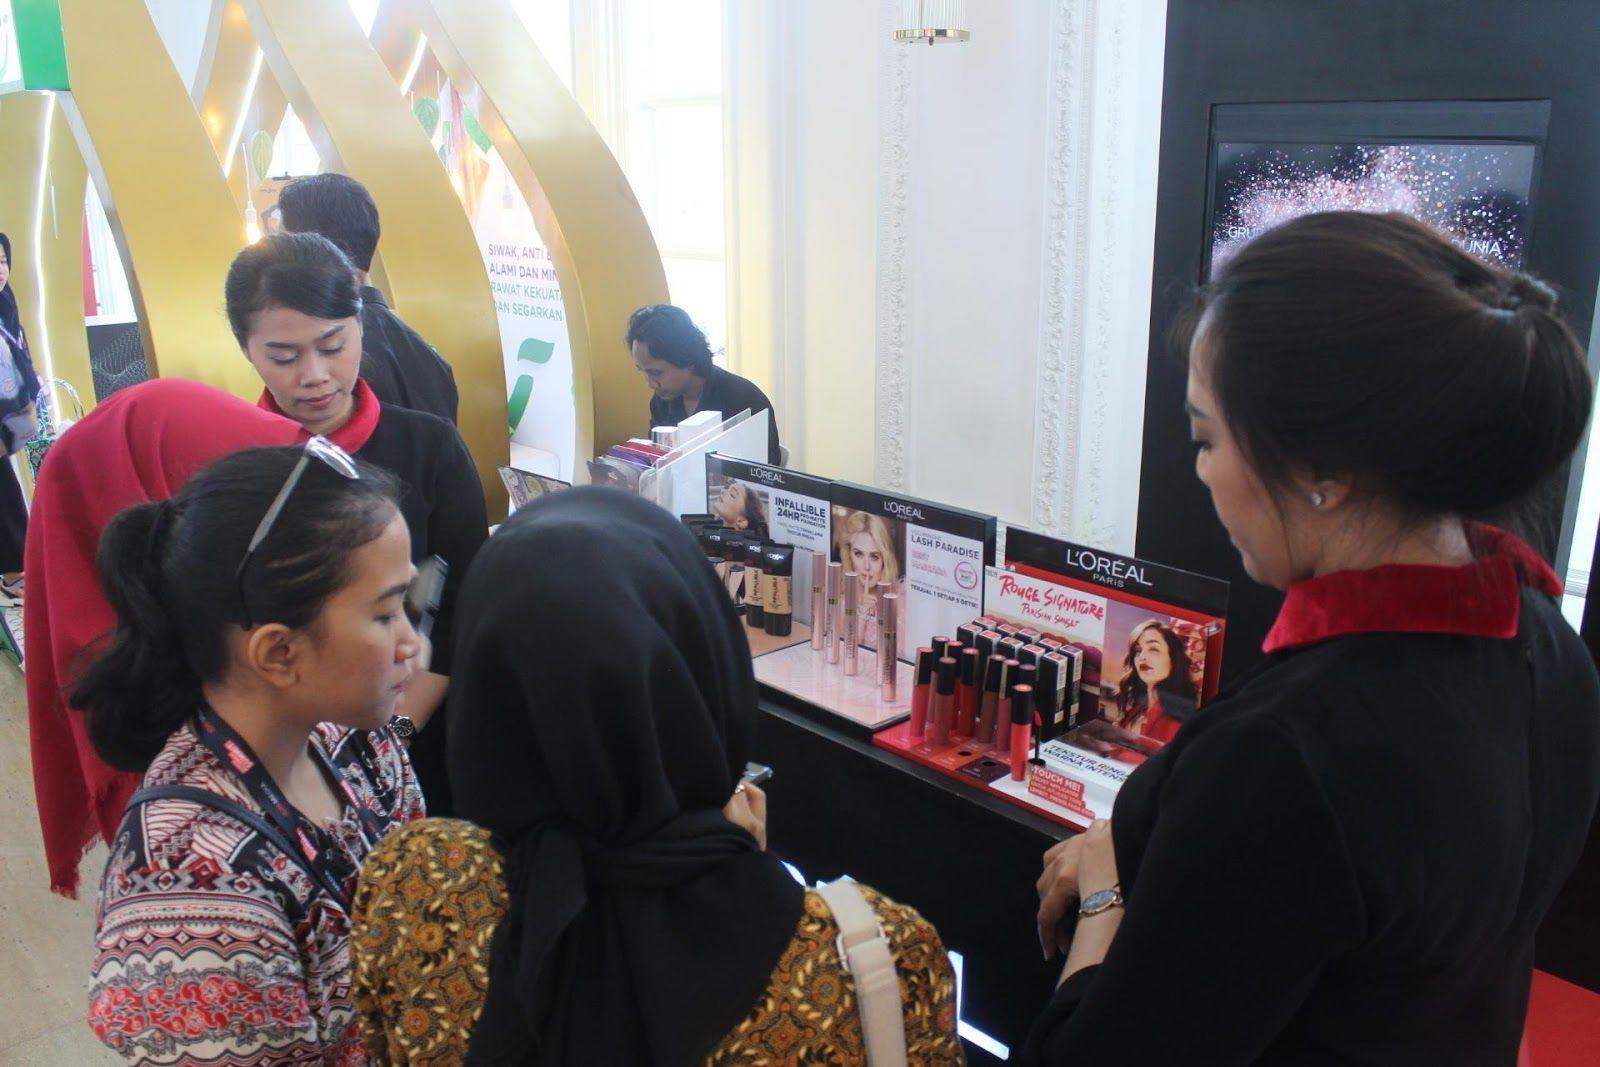 Hadirkan Teknologi Terbaru di IMS 2020, Booth L'Oreal Ramai Pengunjung